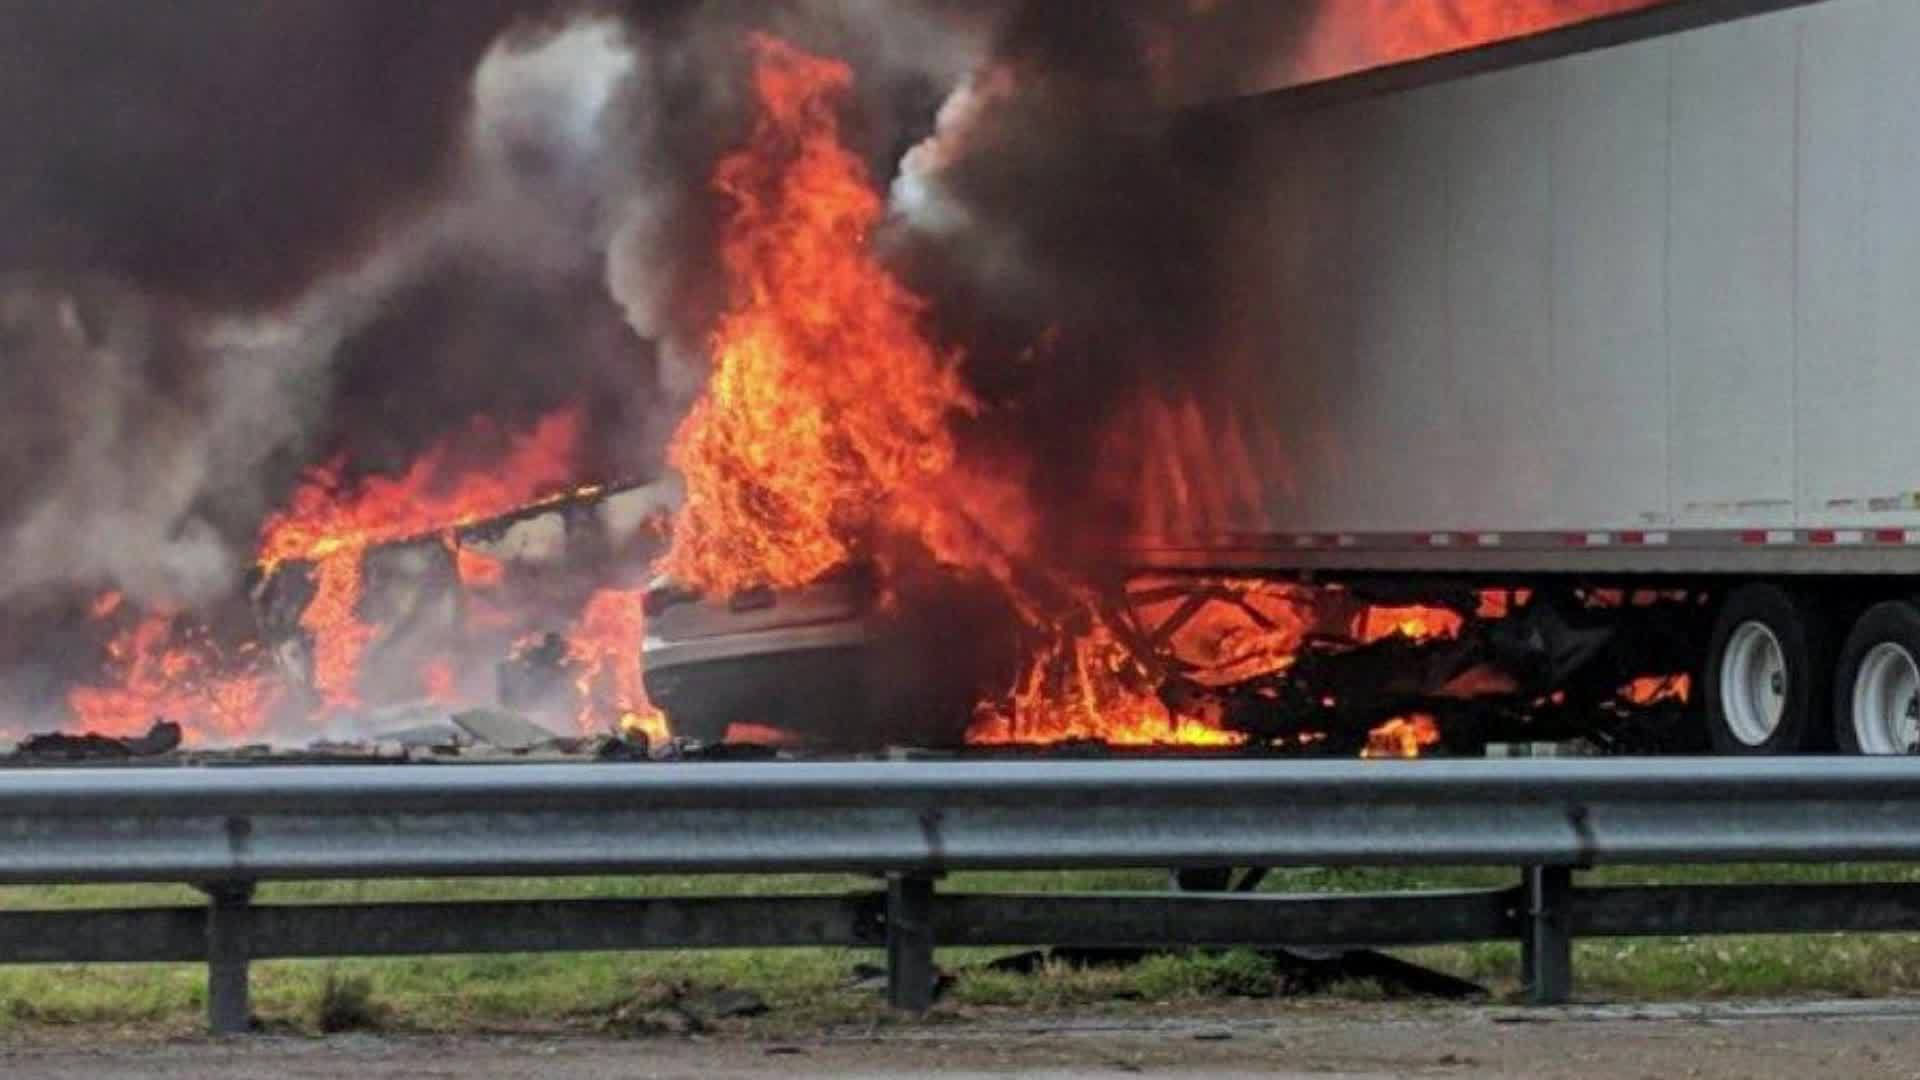 Florida_deadly_crash_newser_0_20190104172012